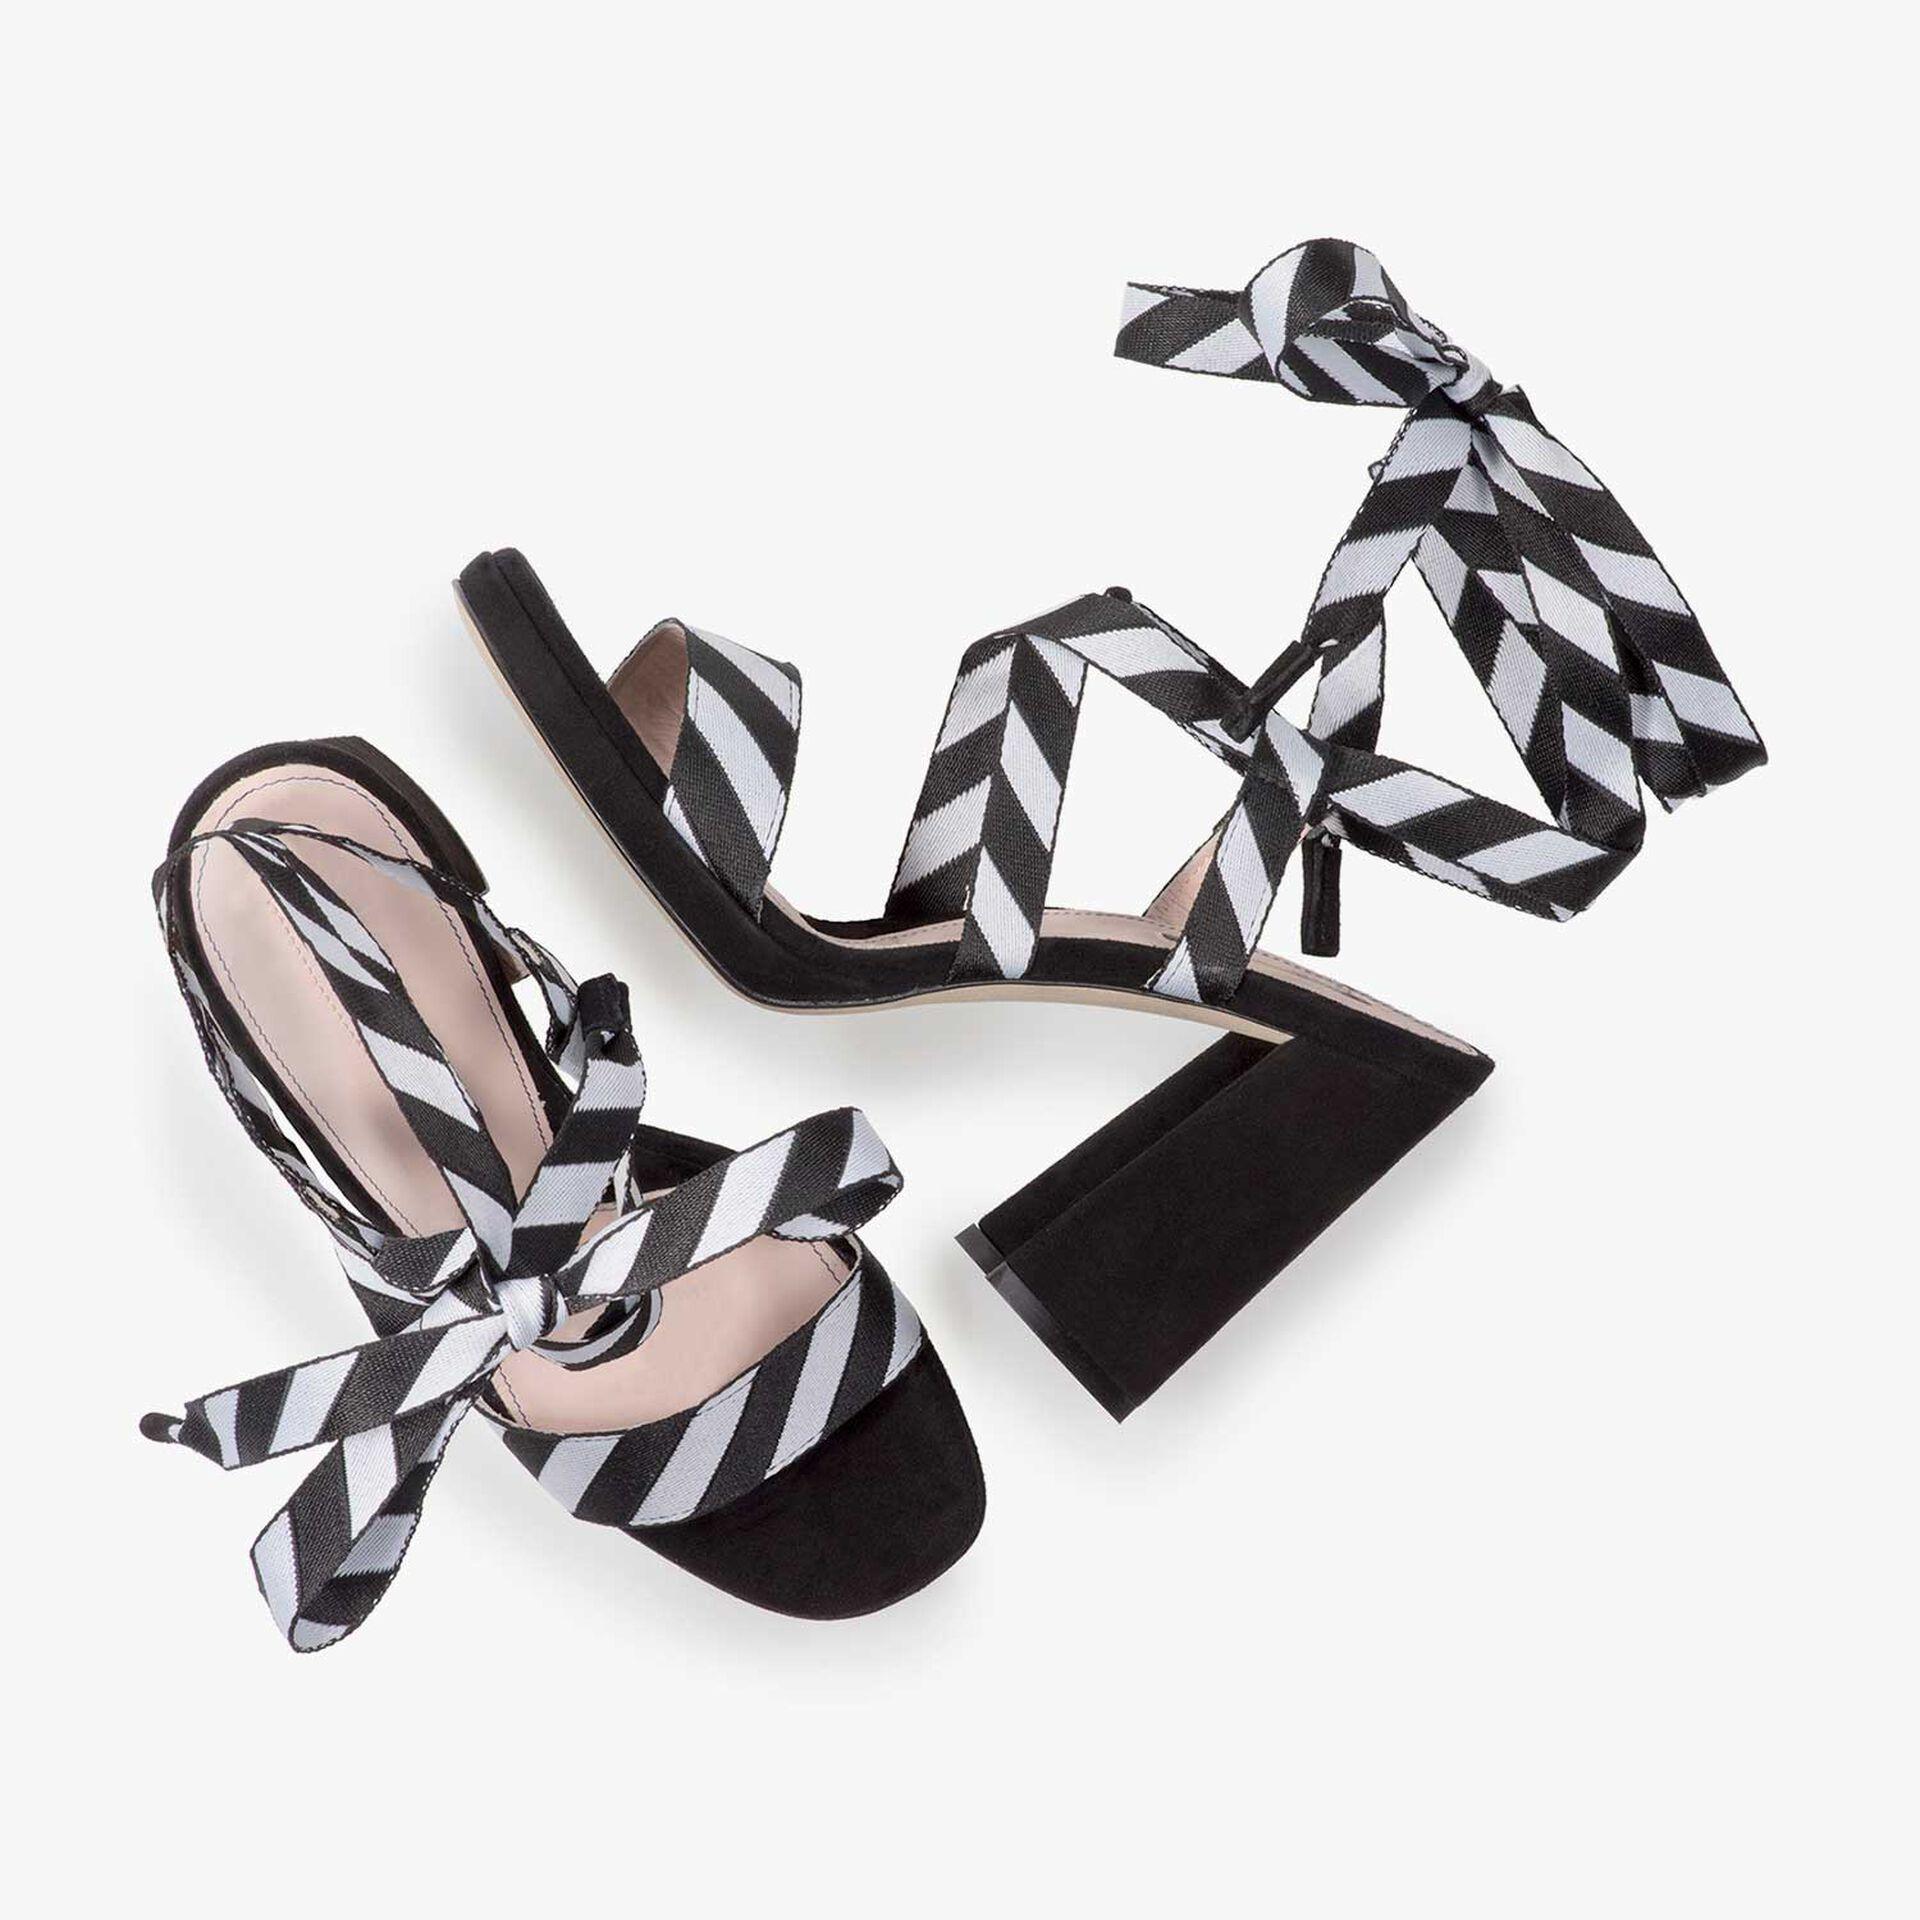 Black high-heeled sandal